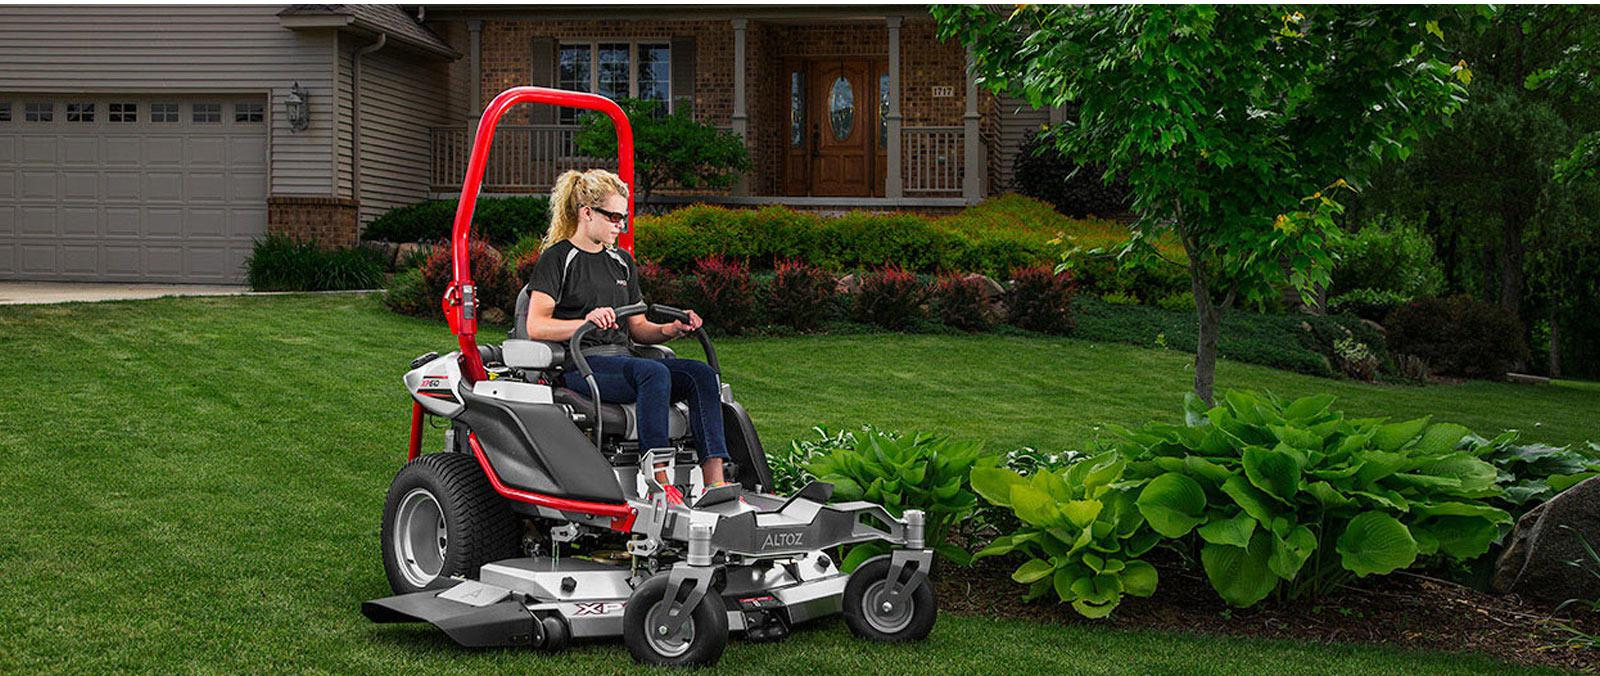 All terrain equipment co beaumont tx 409 866 1755 for Sander s motor co beaumont tx